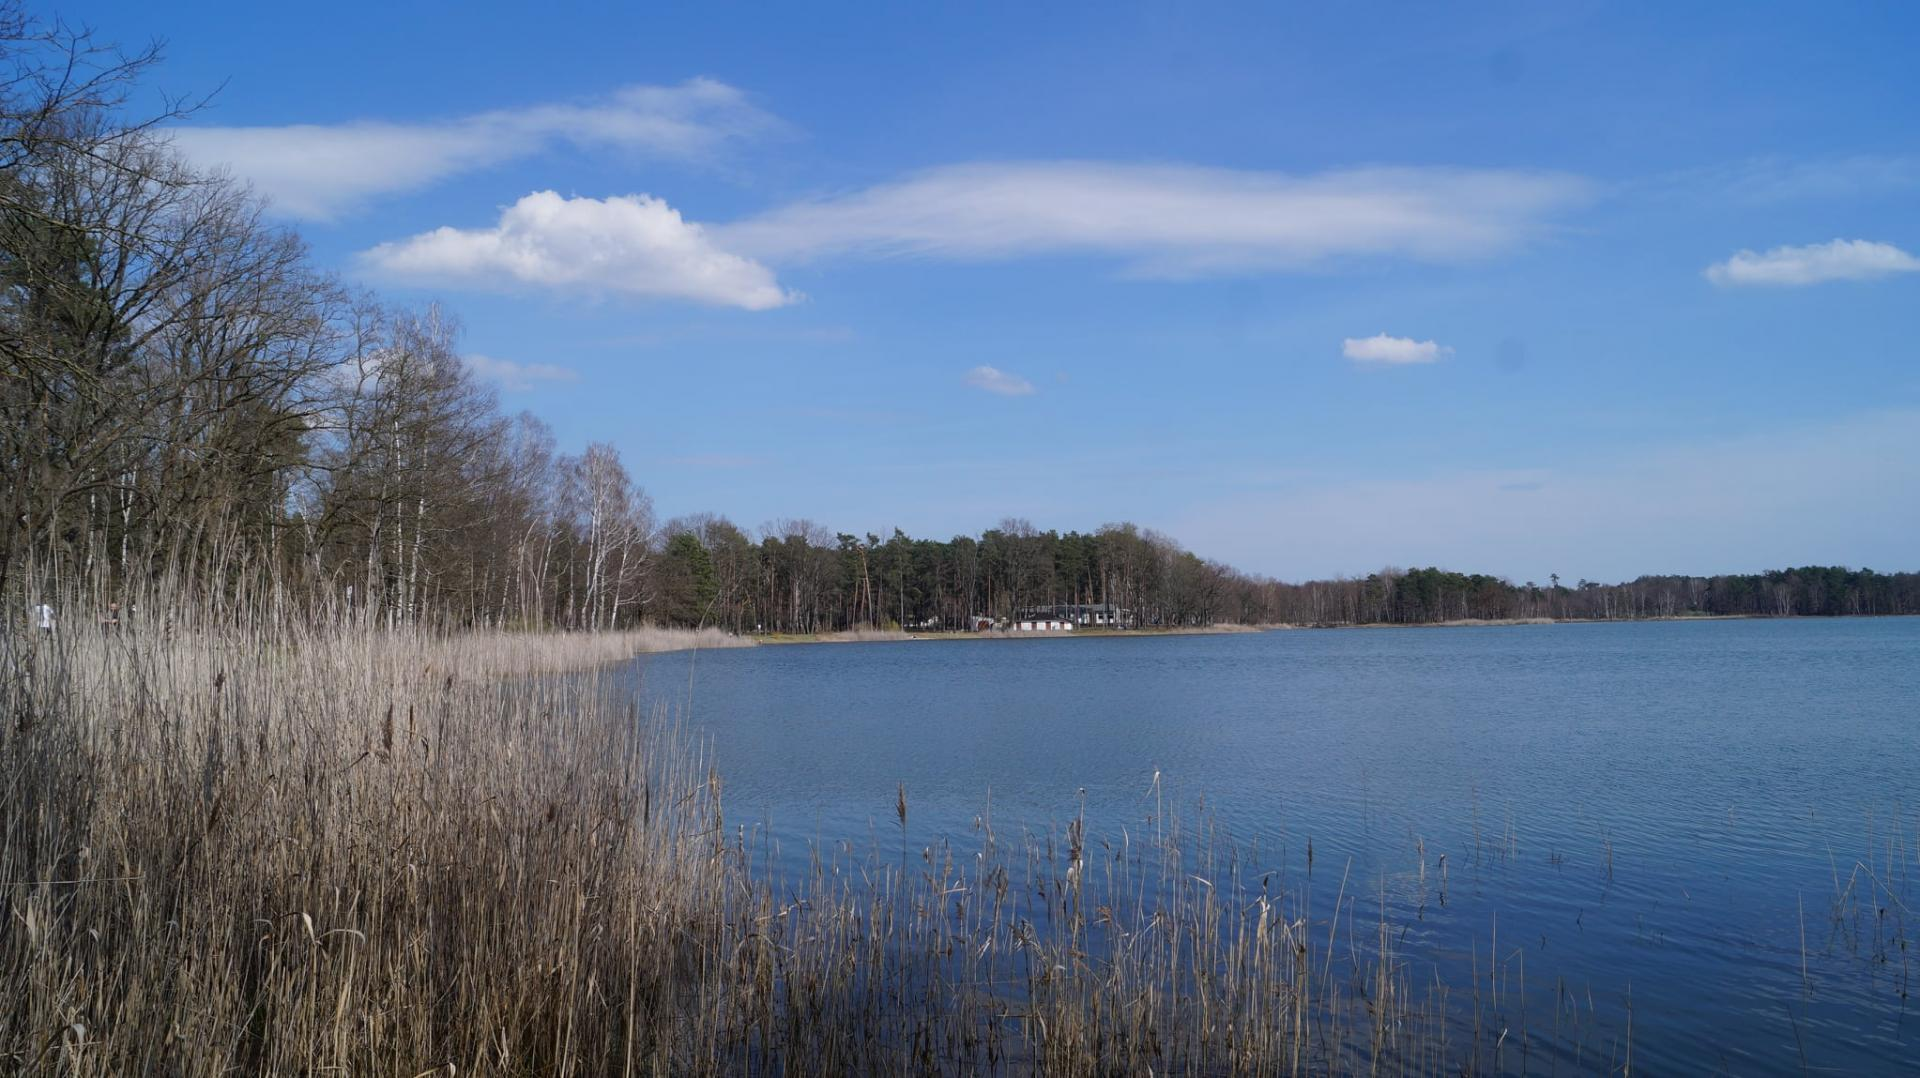 Körbaer Teich im April 2021